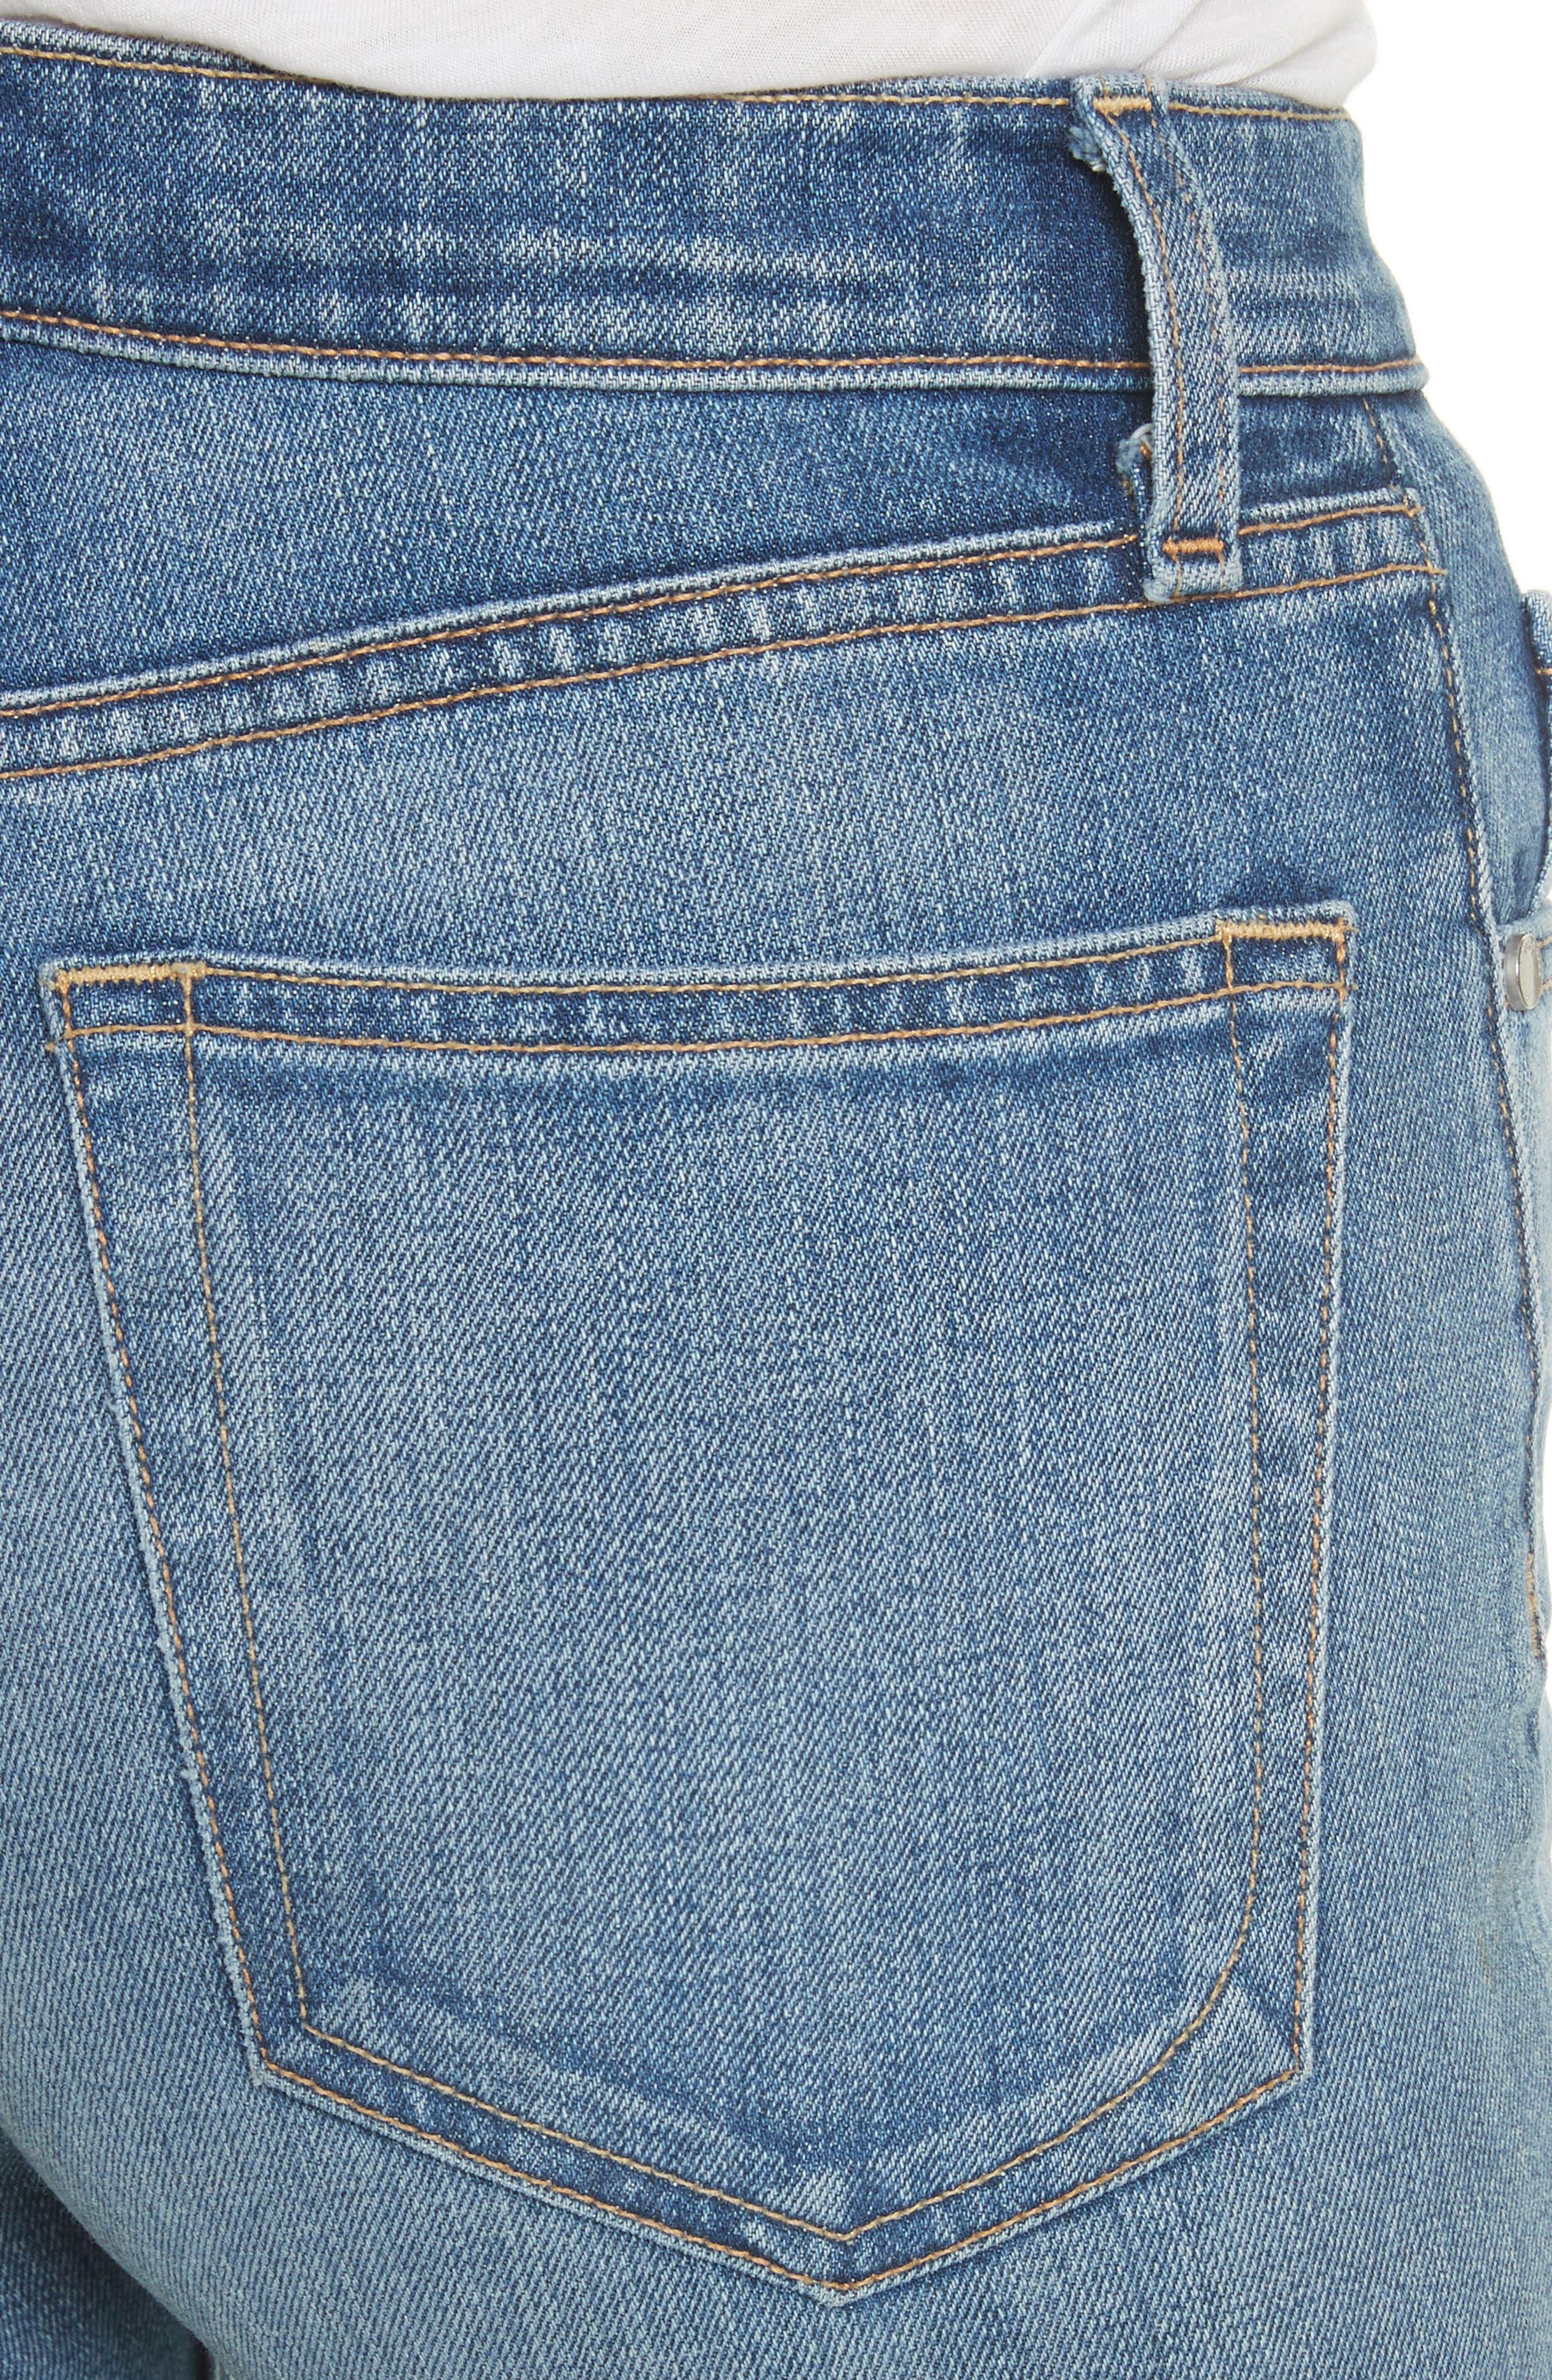 Straight Leg Jeans,                             Alternate thumbnail 4, color,                             420